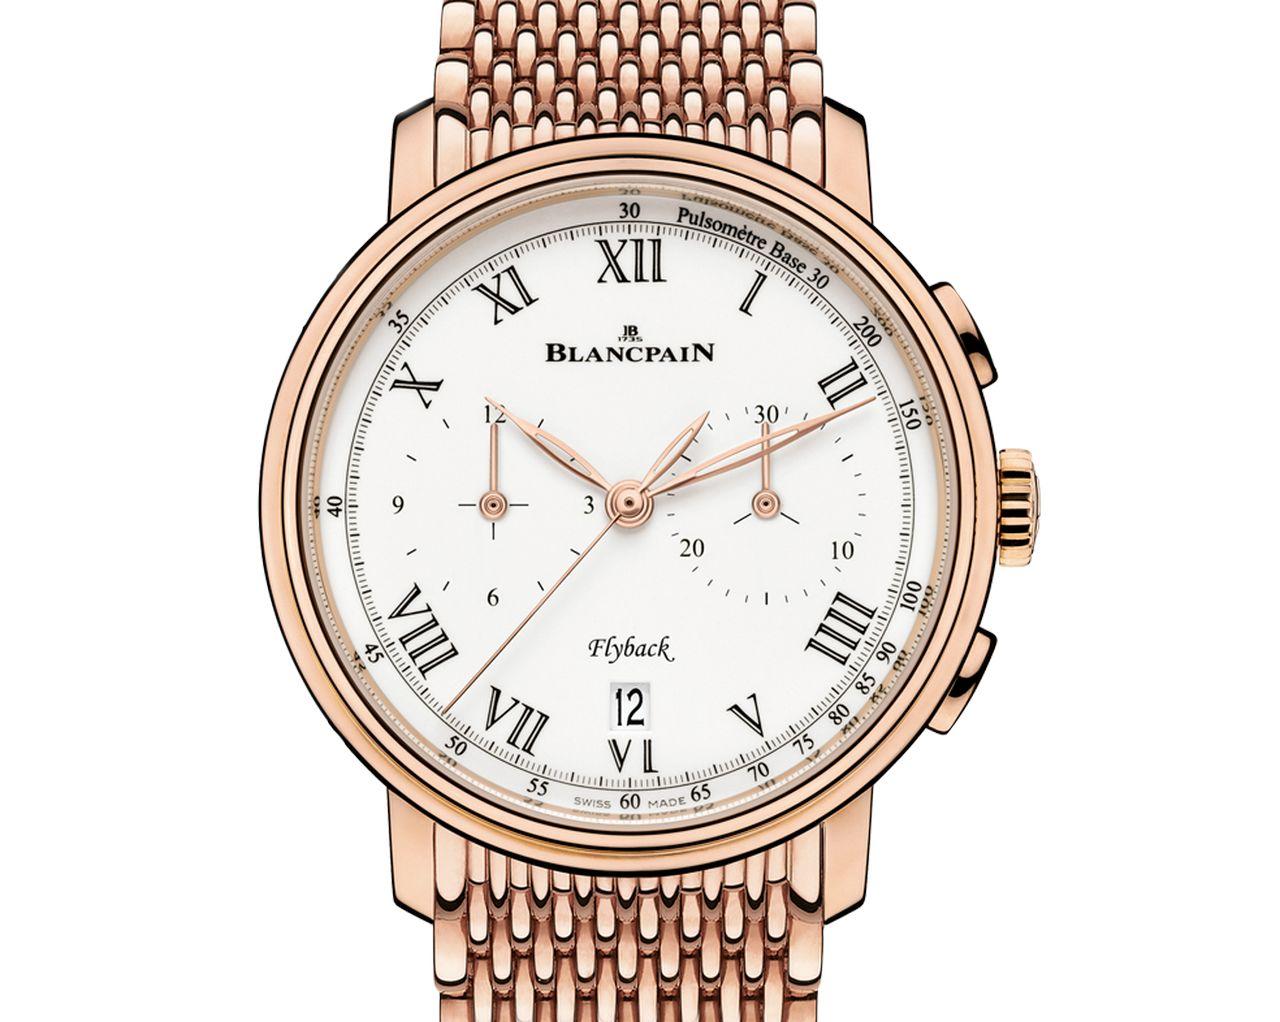 blancpain-villeret-pulsometer-flyback-chronograph-Ref. 6680F-3631-MMB-prezzo-price-0-100_4